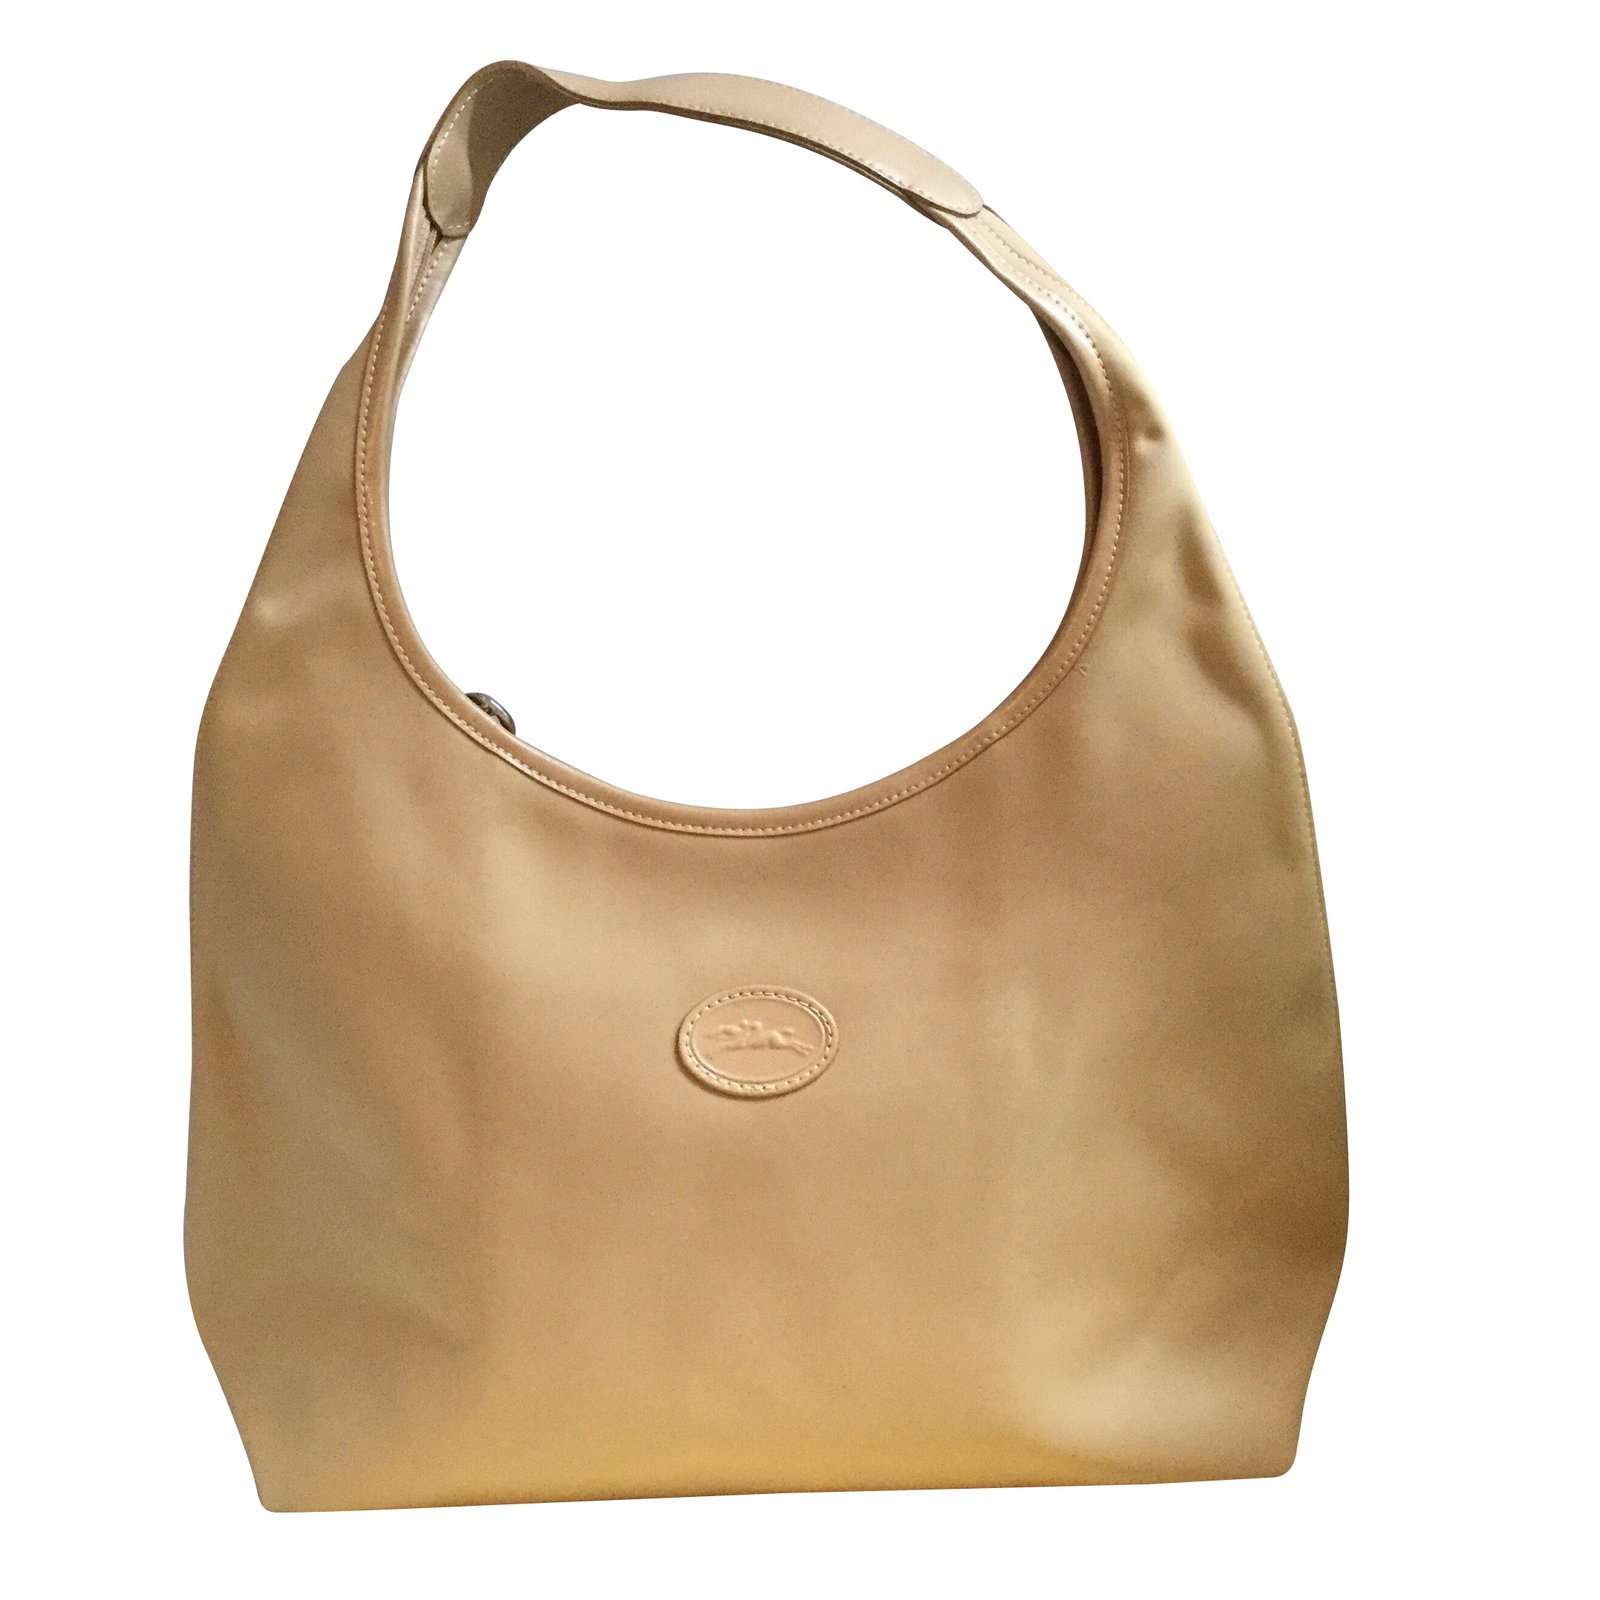 Cabas Ref Longchamp Sac Nn0oxwkp8 Caramel Nylon Shopping CsrthdQ